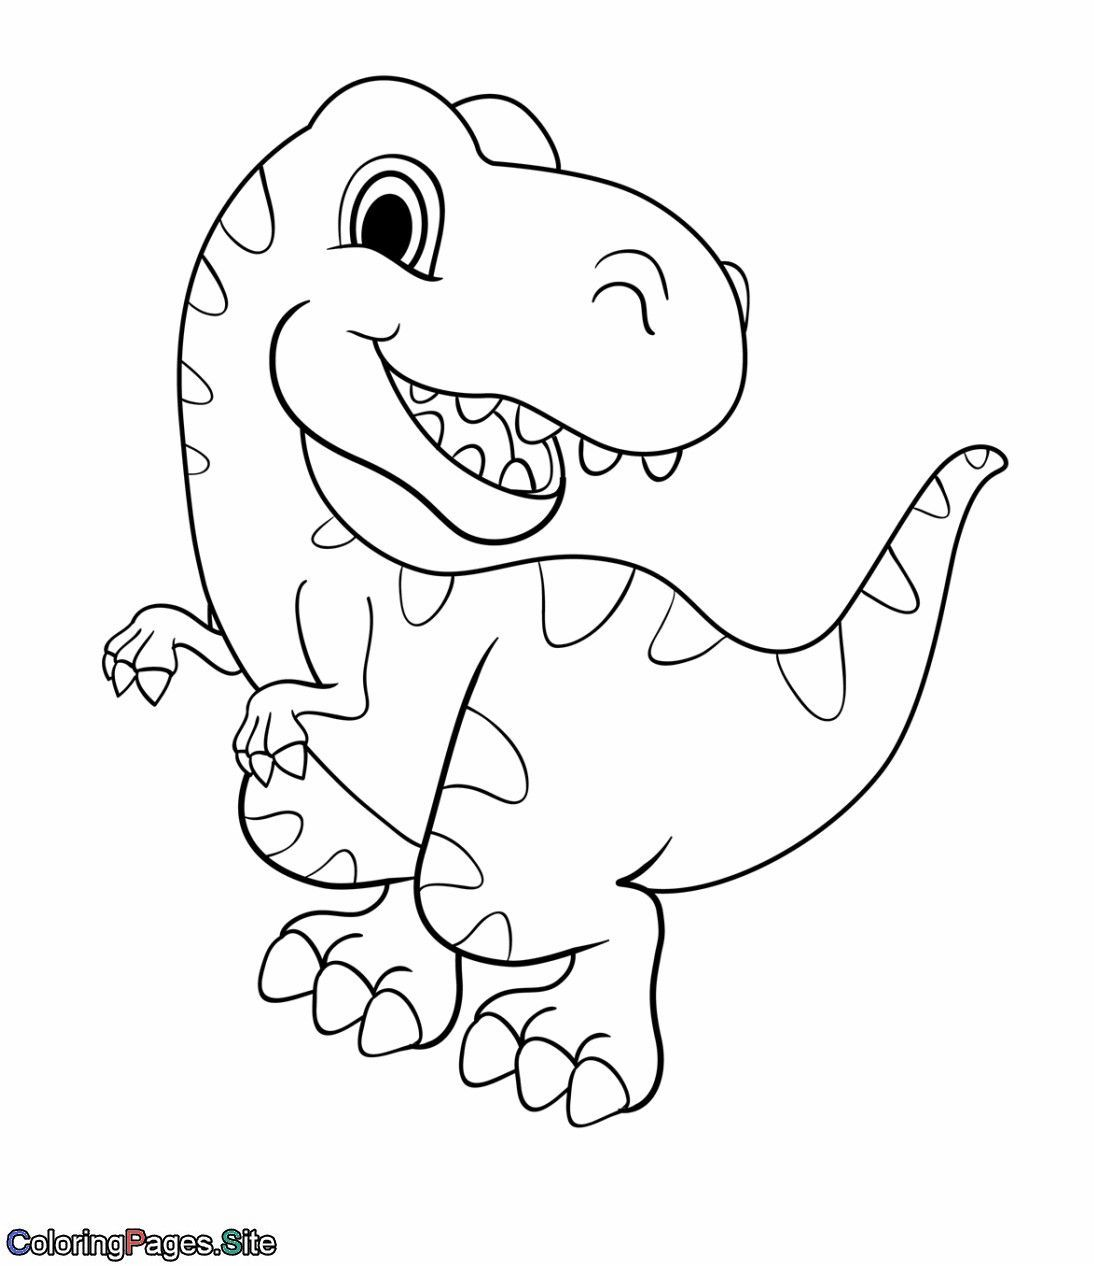 Dinosaur Coloring Pages Cute Cartoon Dinosaur Coloring Page Free Printable Coloring Pages Entitlementtrap Com Dinosaur Coloring Pages Dinosaur Coloring Dinosaur Coloring Sheets